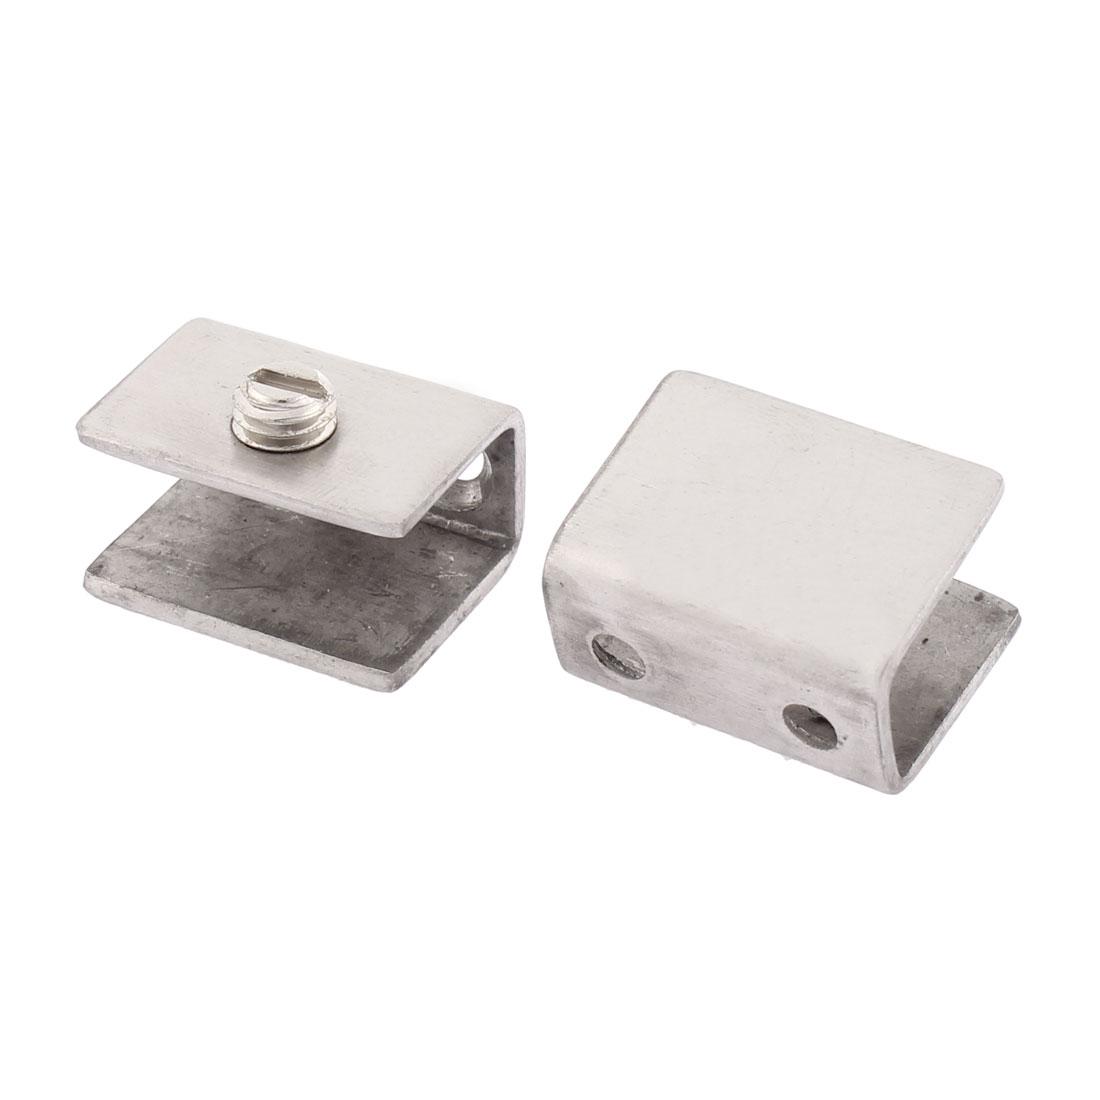 2pcs Rectangular-Shape Glass Shelf Panel Clamp Clip Bracket Holder